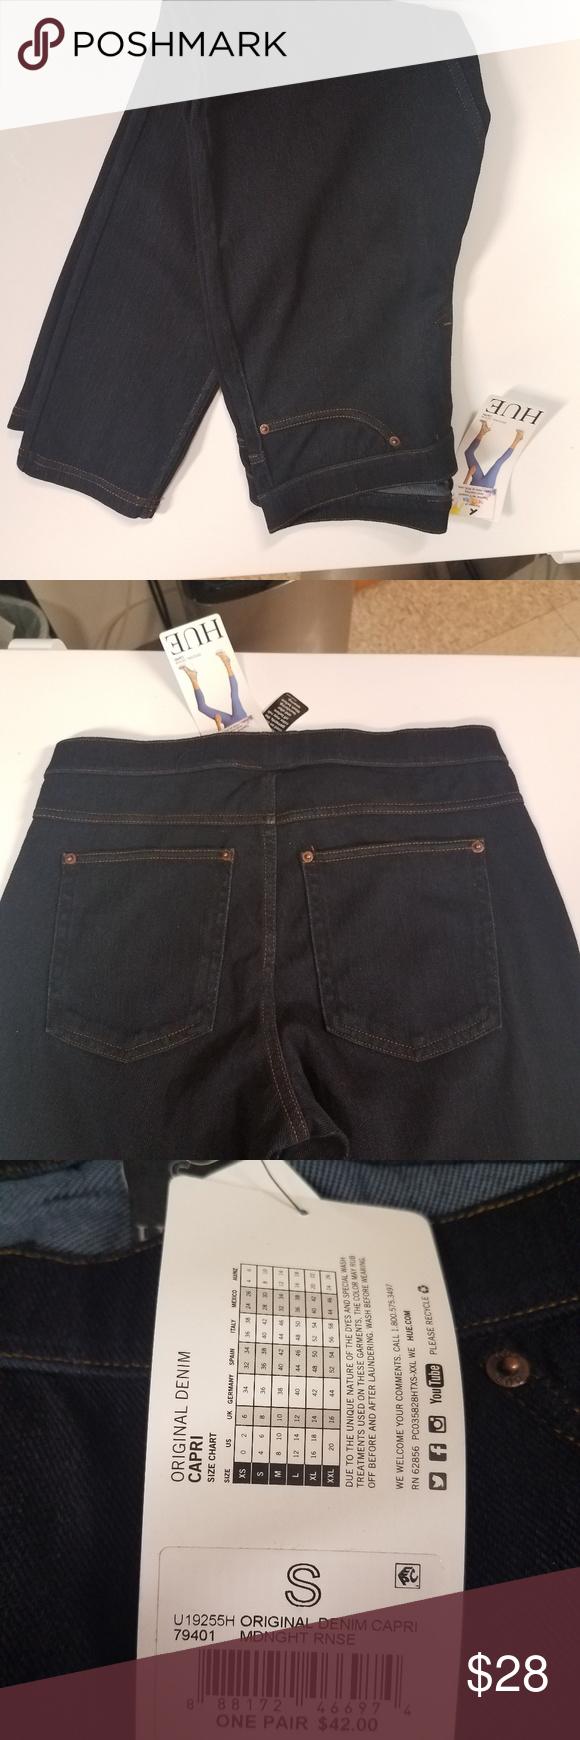 6cf855f72237cf New HUE Original Denim Capri S Add these capri leggings to your collection  as a denim